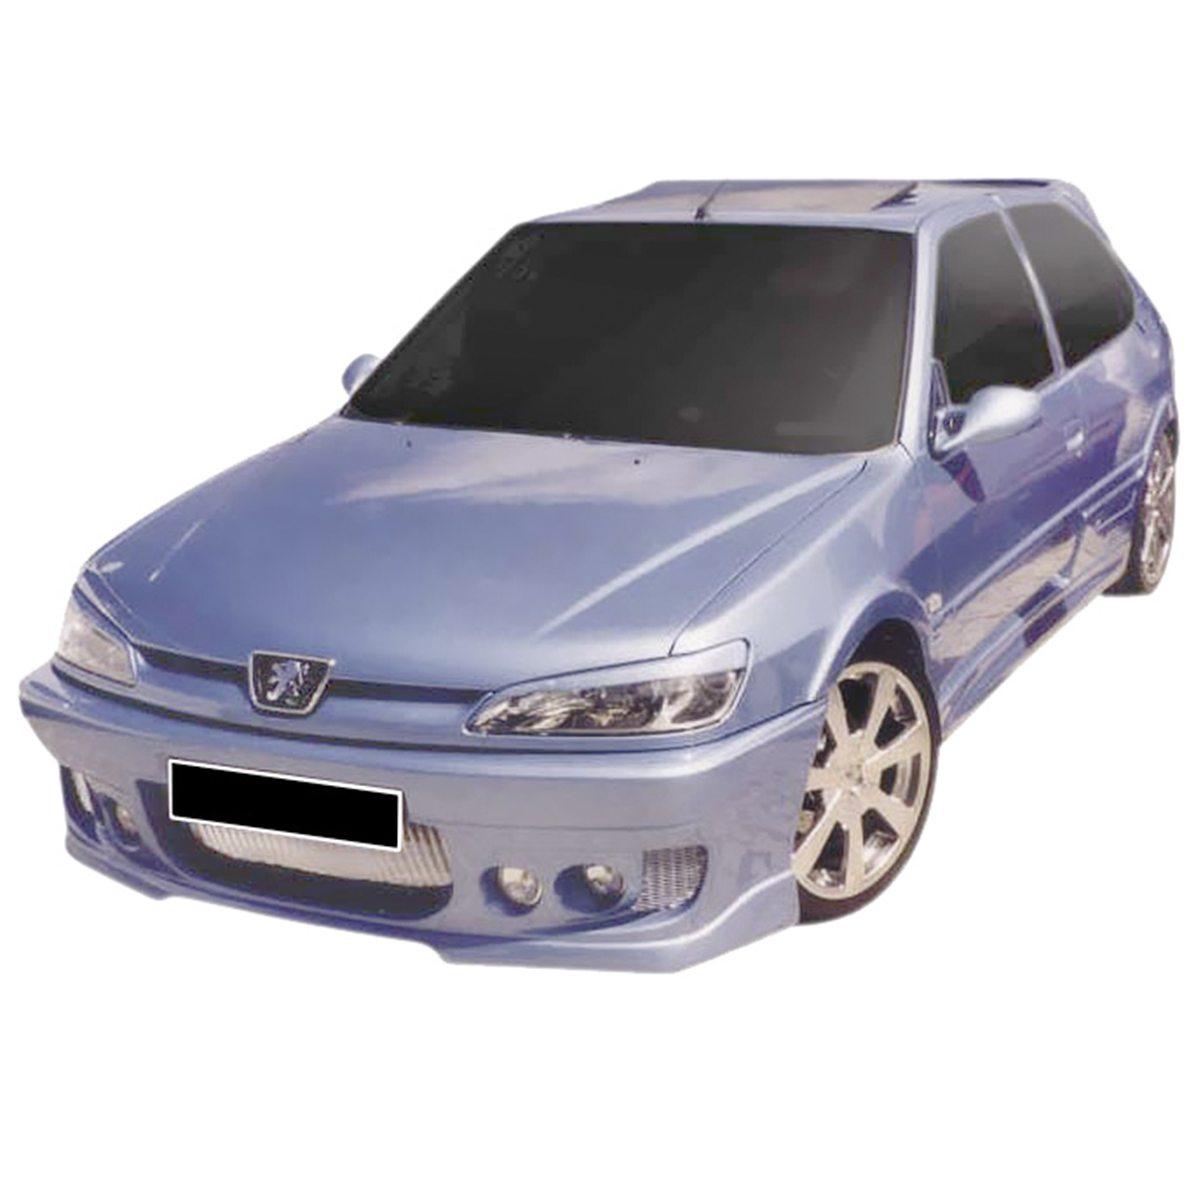 Peugeot-306-Probe-frt-PCA094